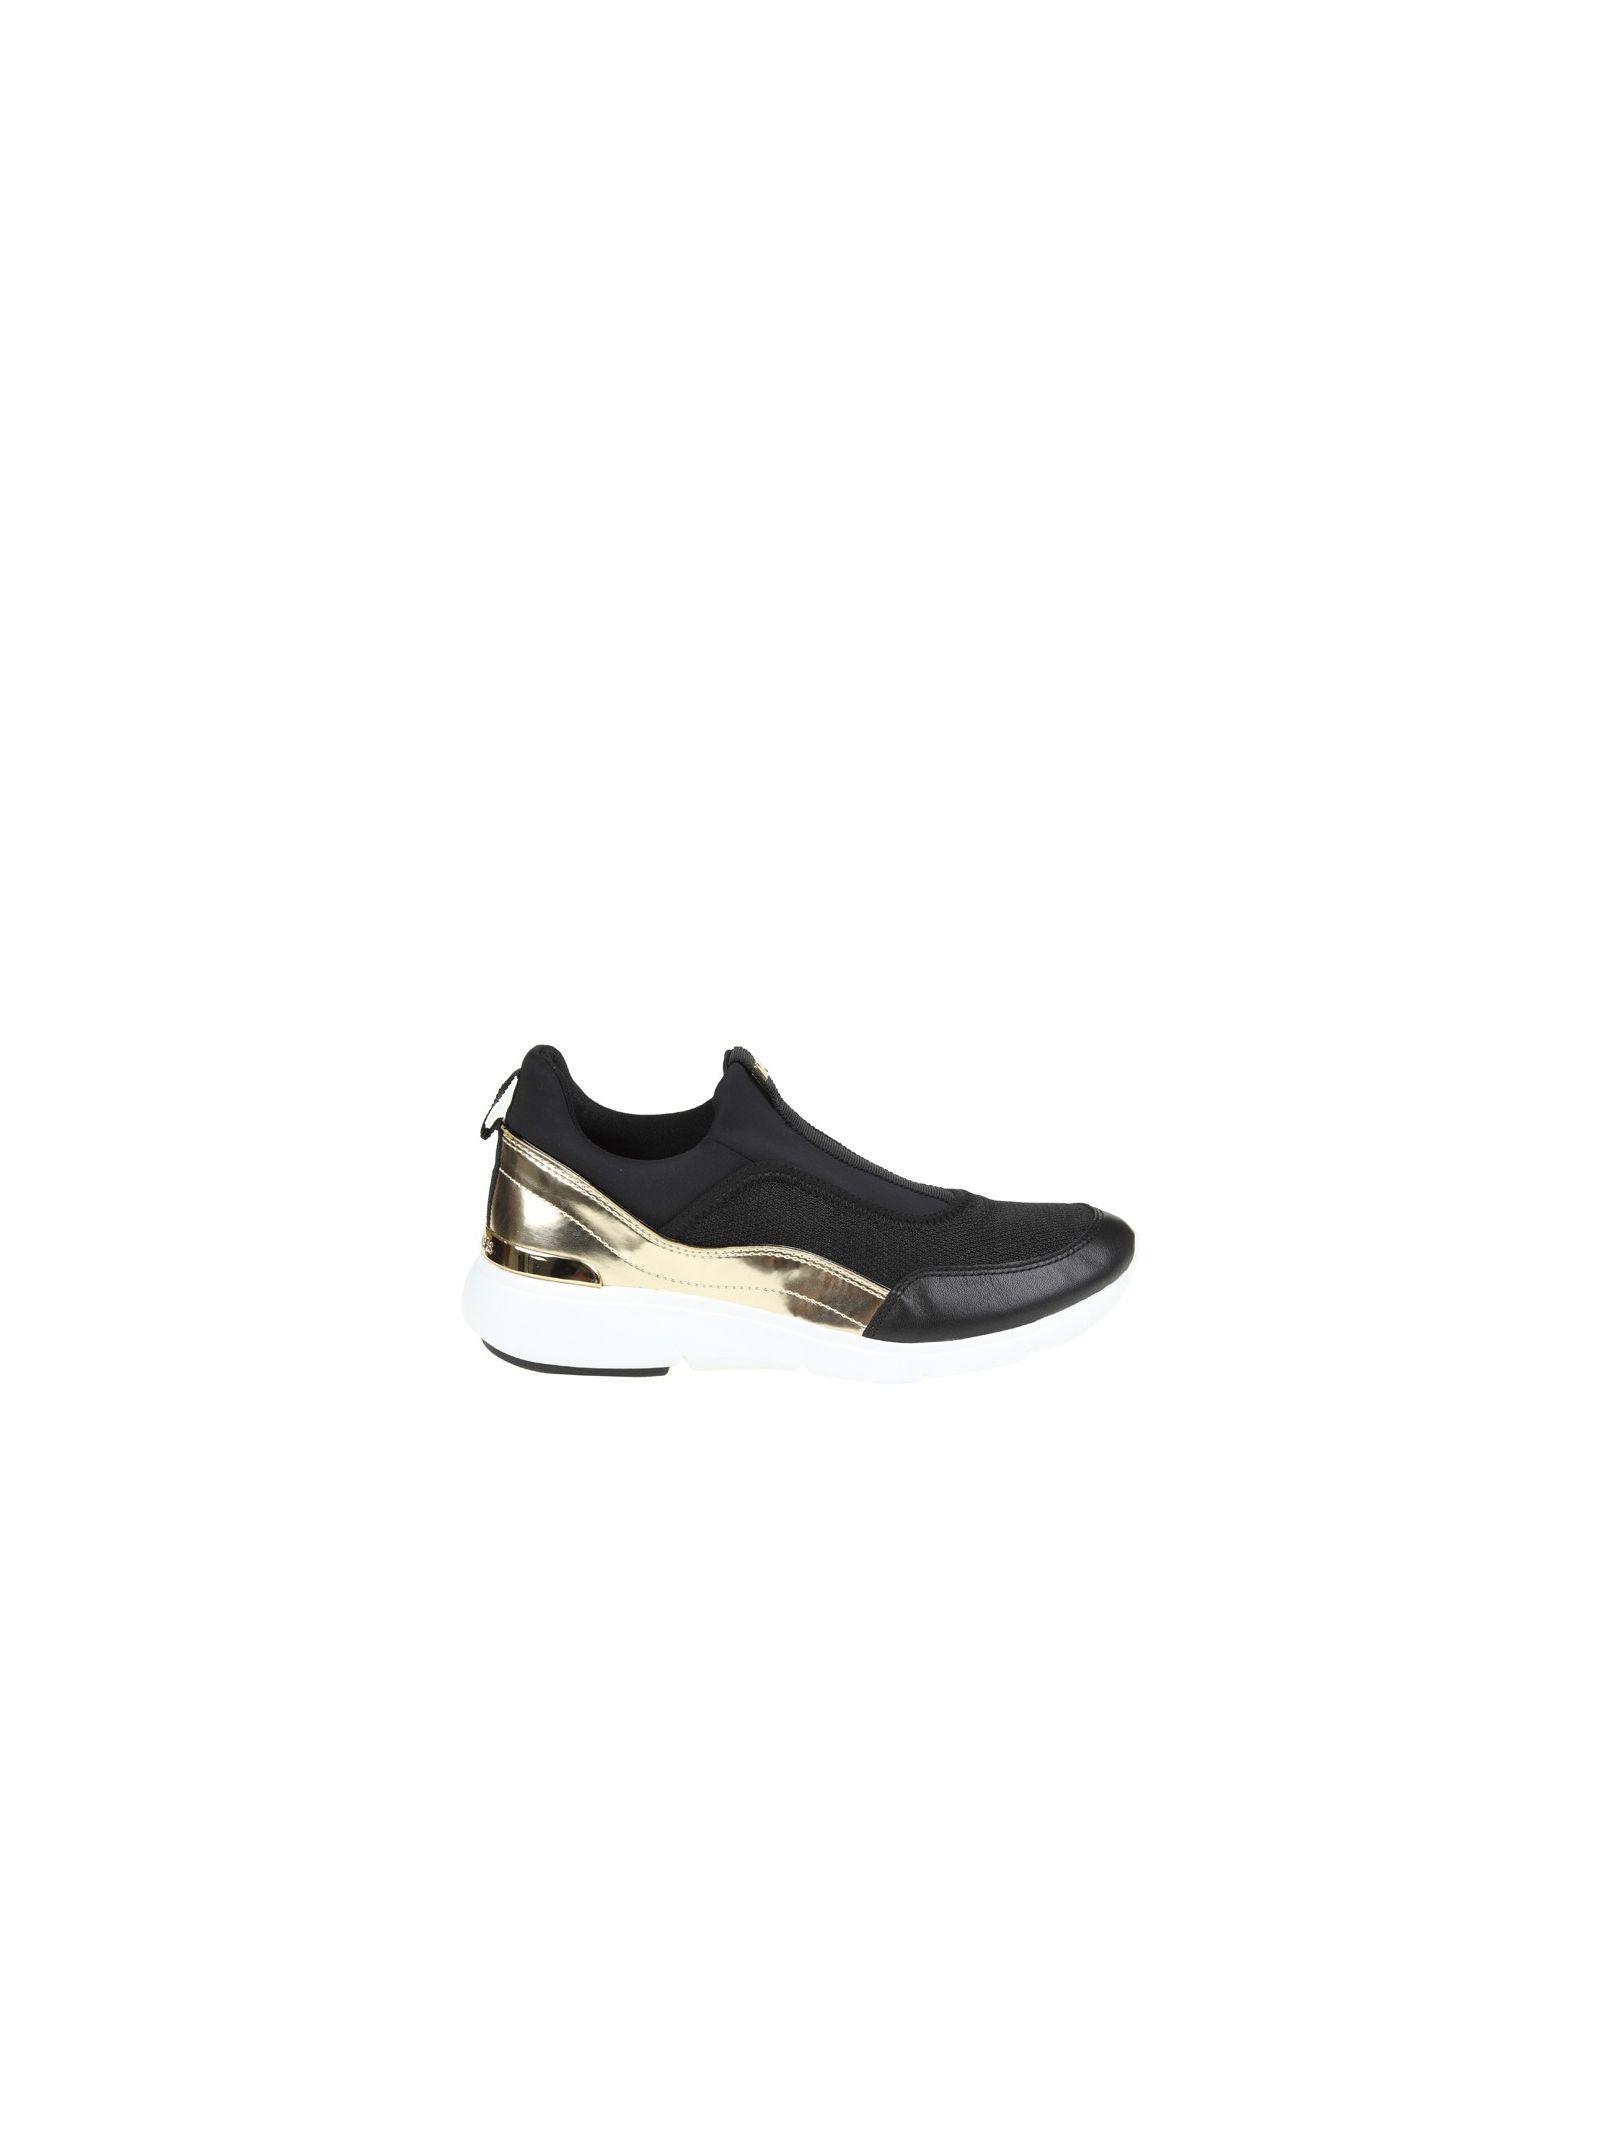 michael kors female 224337 michael kors ace sneakers